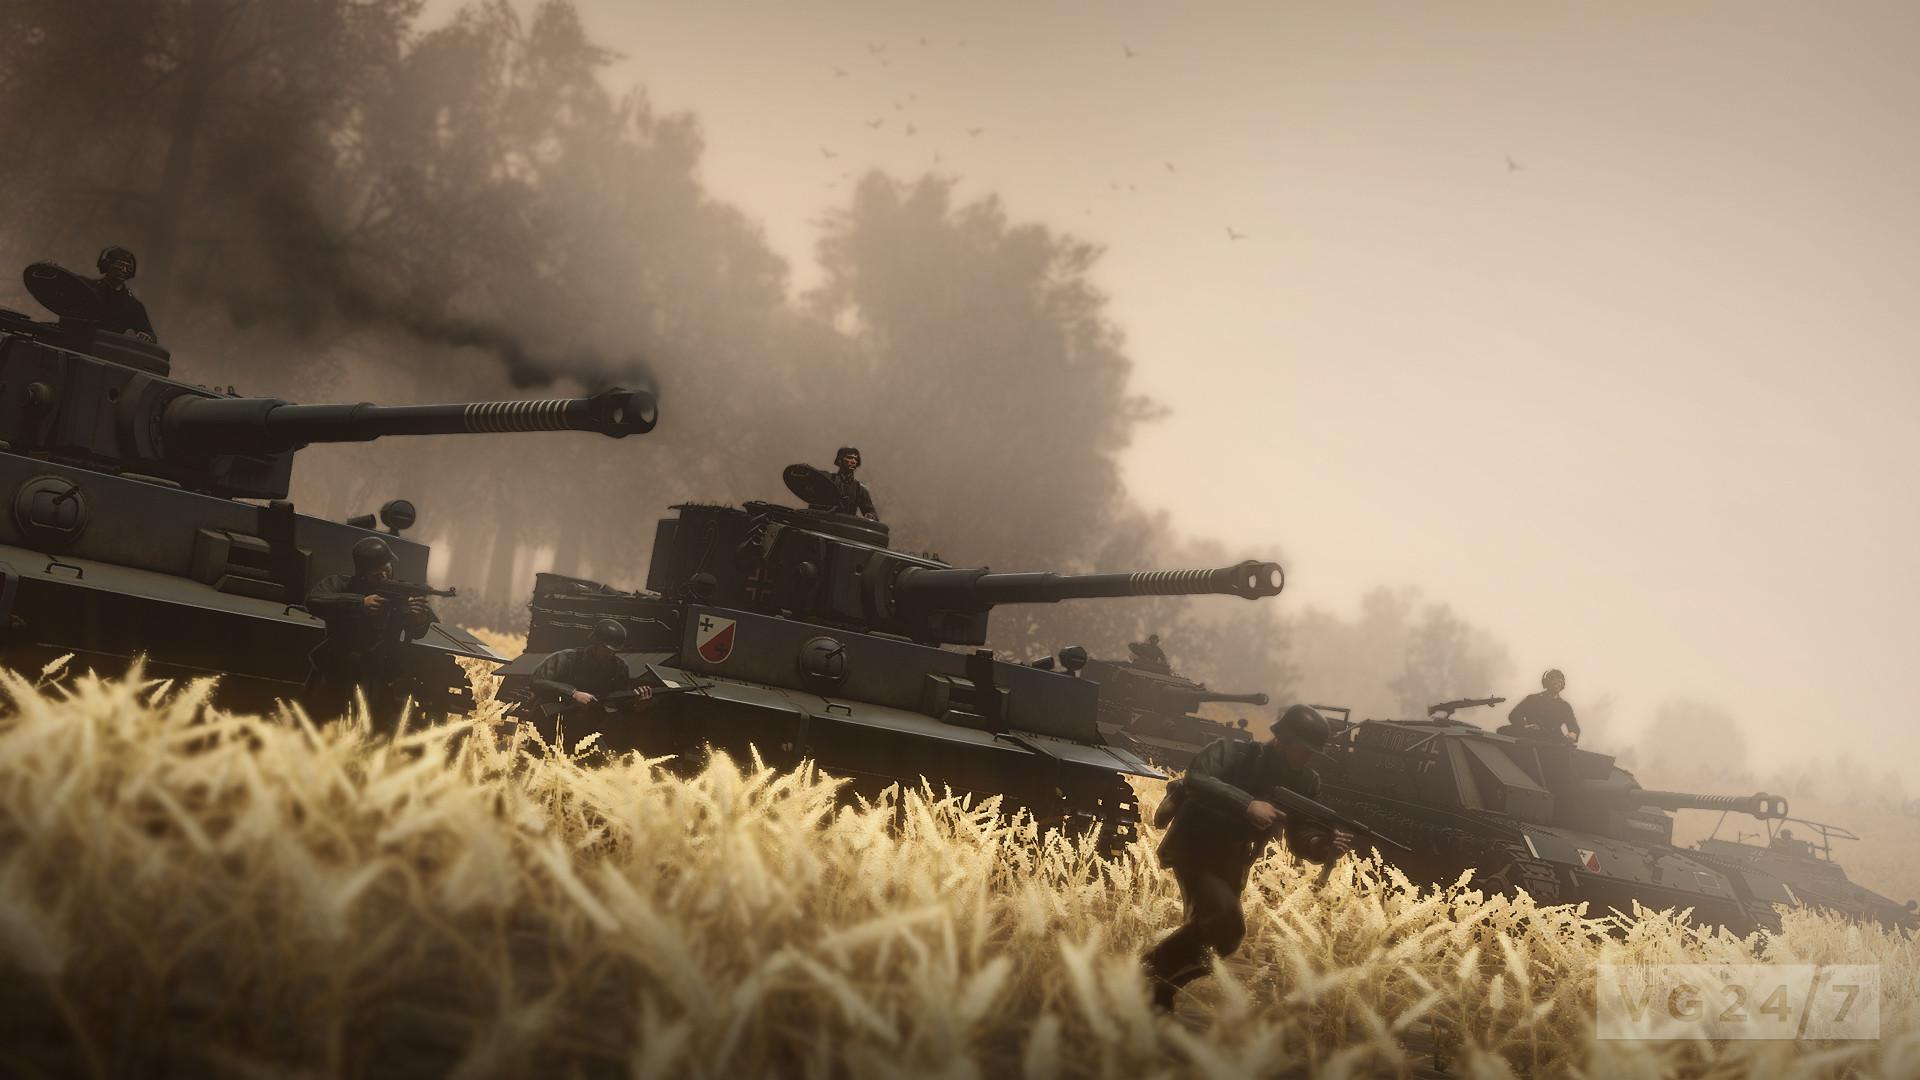 9550HandG_Action_Screenshot_GDC_03. 9551Heroes_And_Generals_FPS_Day.  9552Heroes_And_Generals_Map_view. 9553Heroes_And_Generals_Tiger_Tank_Attack